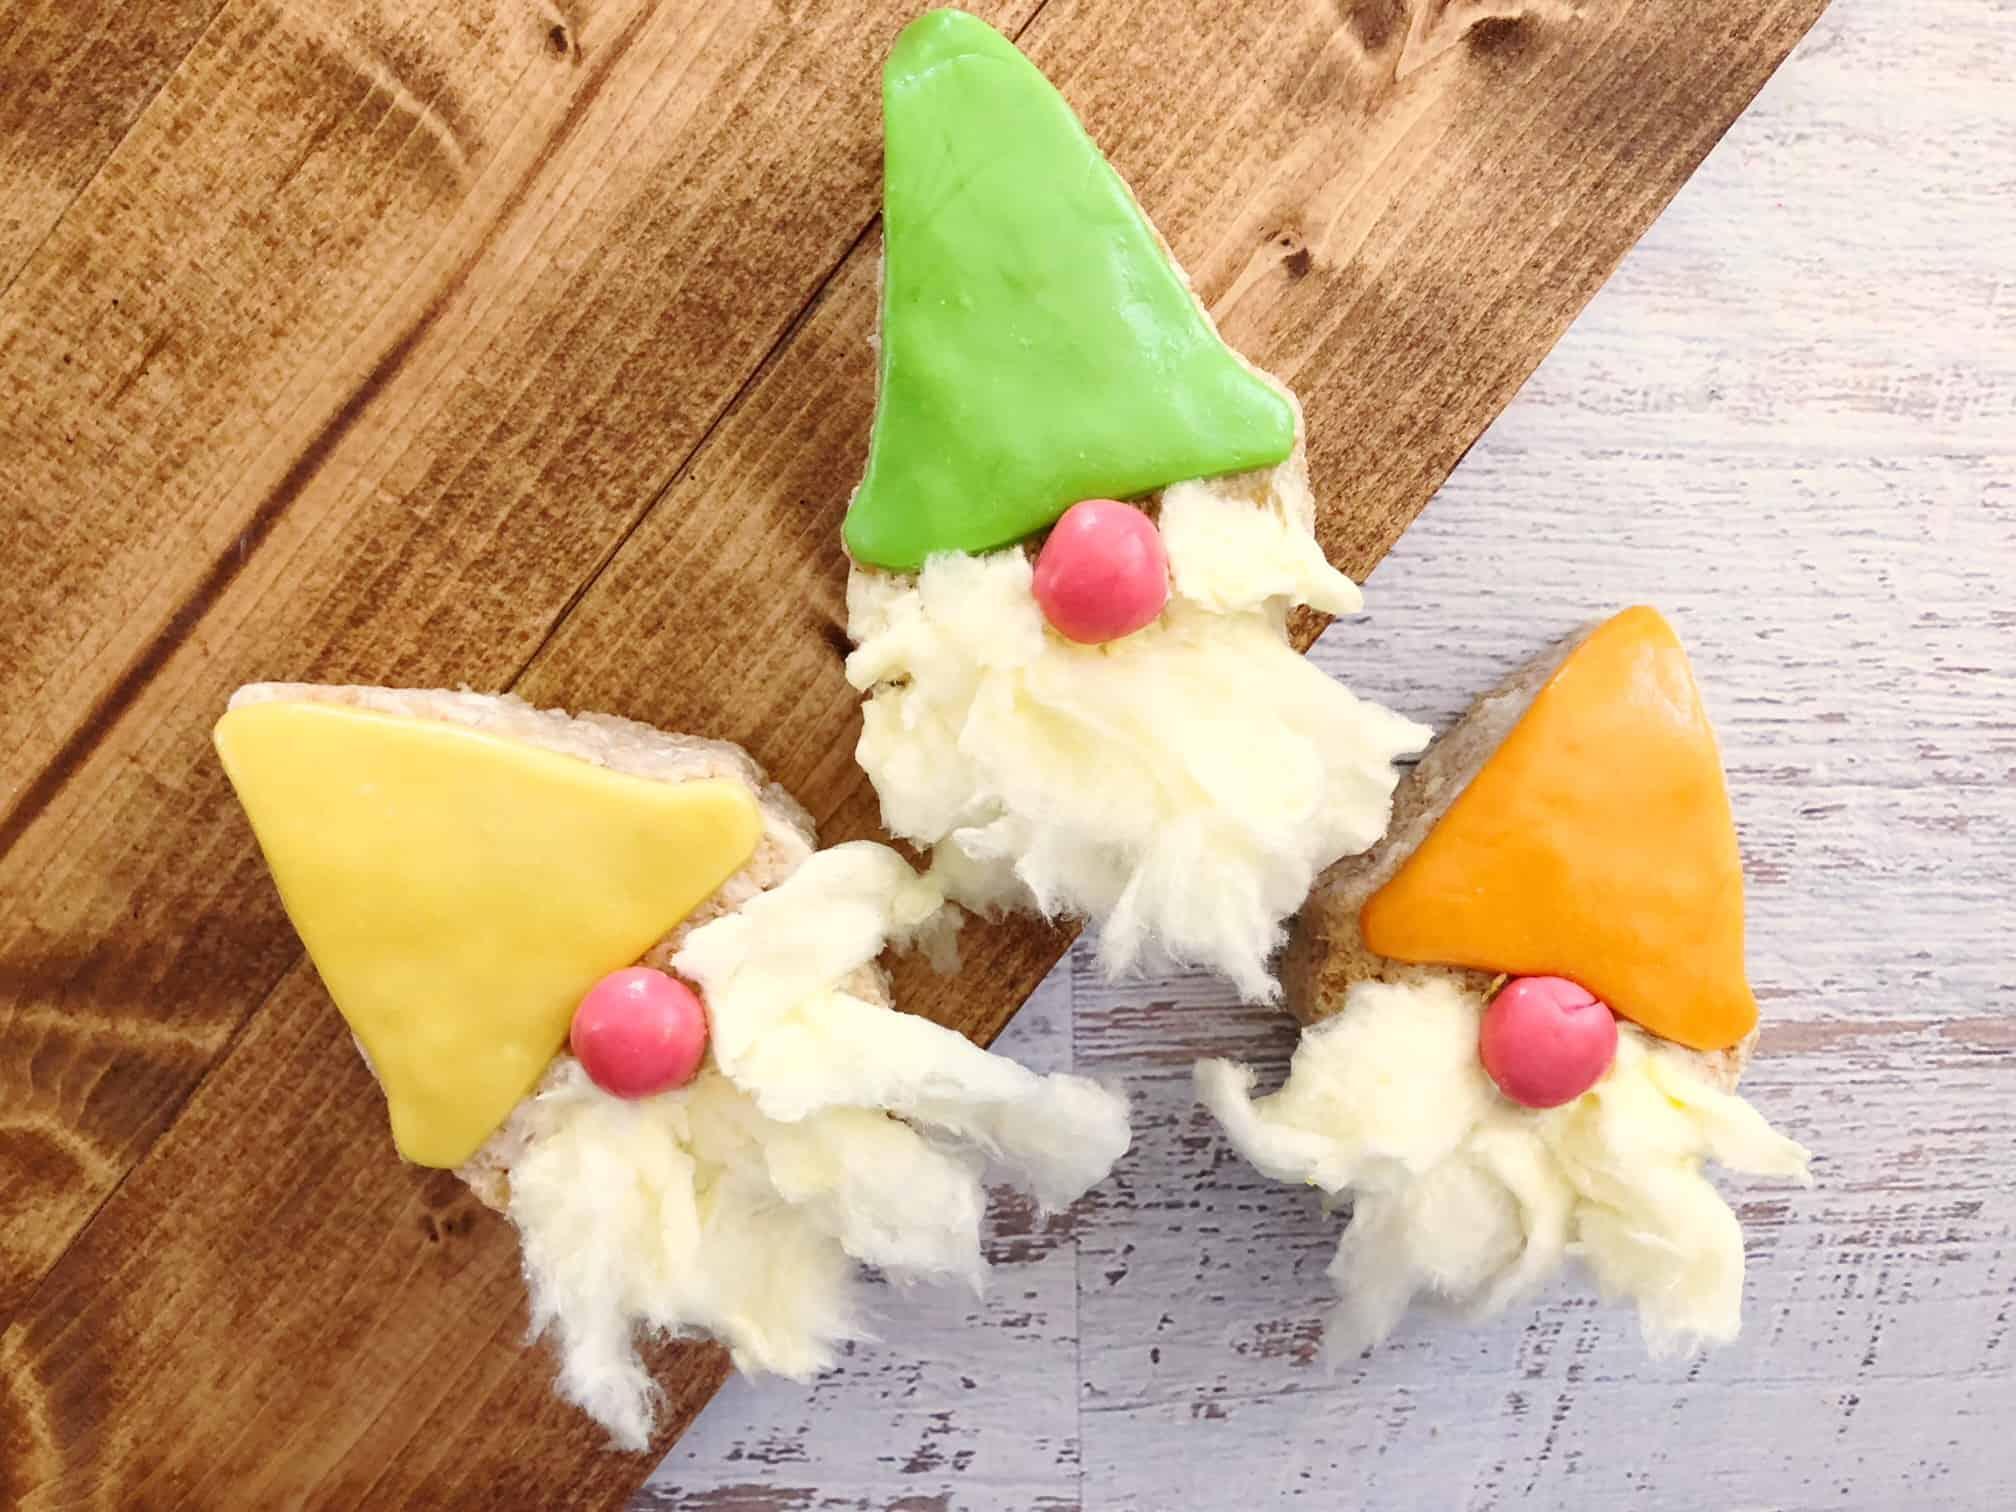 Gnome rice krispies